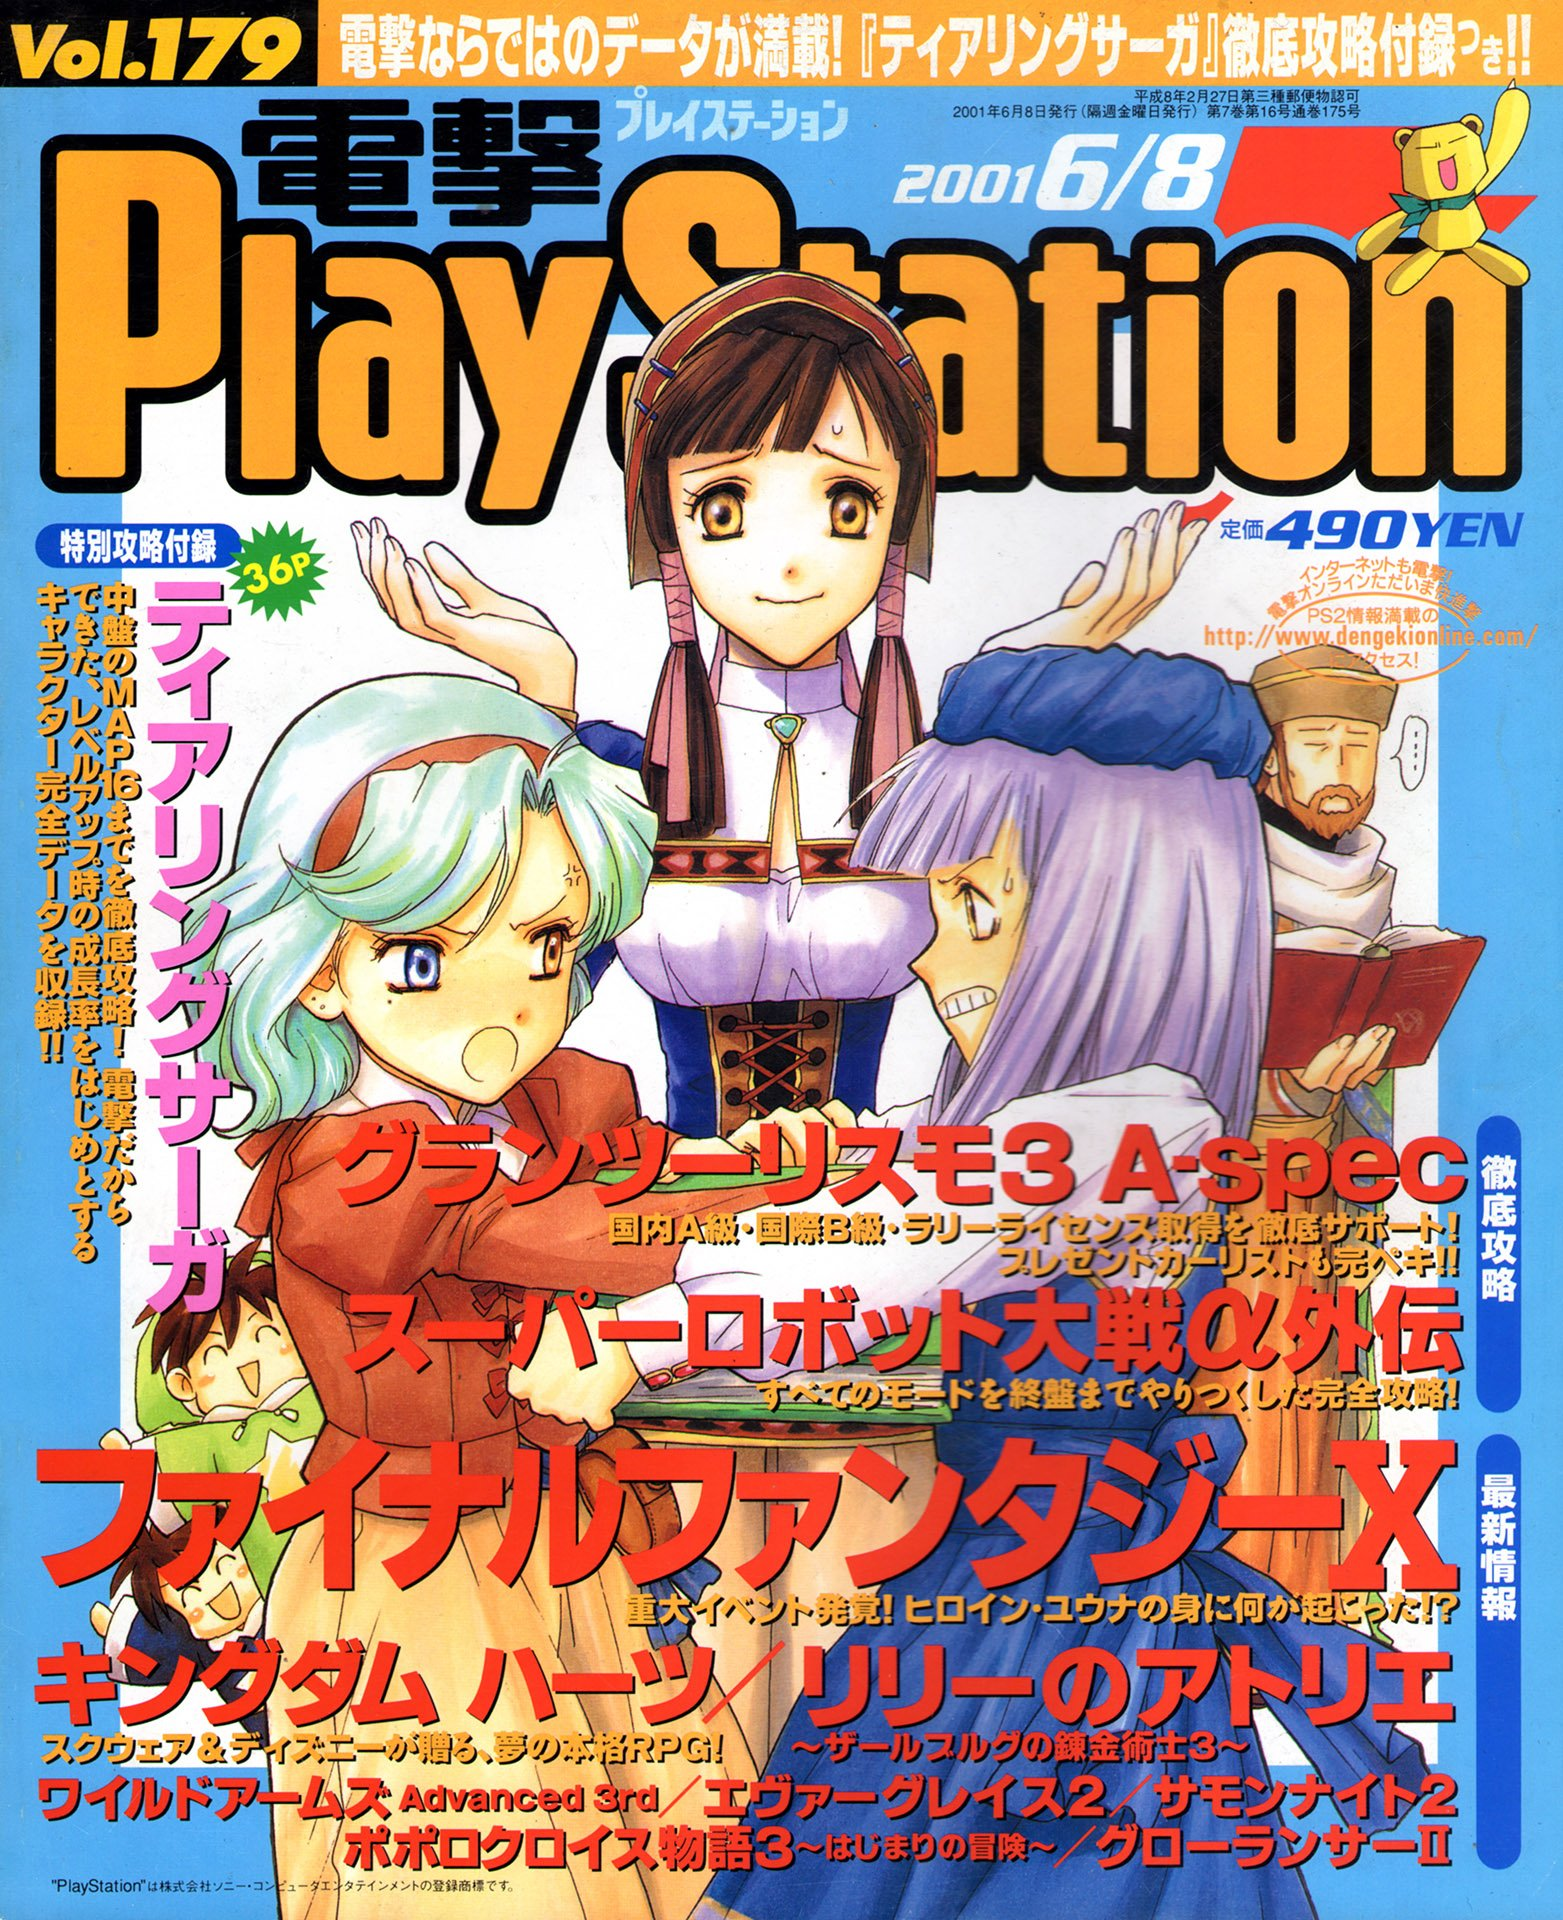 Dengeki PlayStation 179 (June 8, 2001)